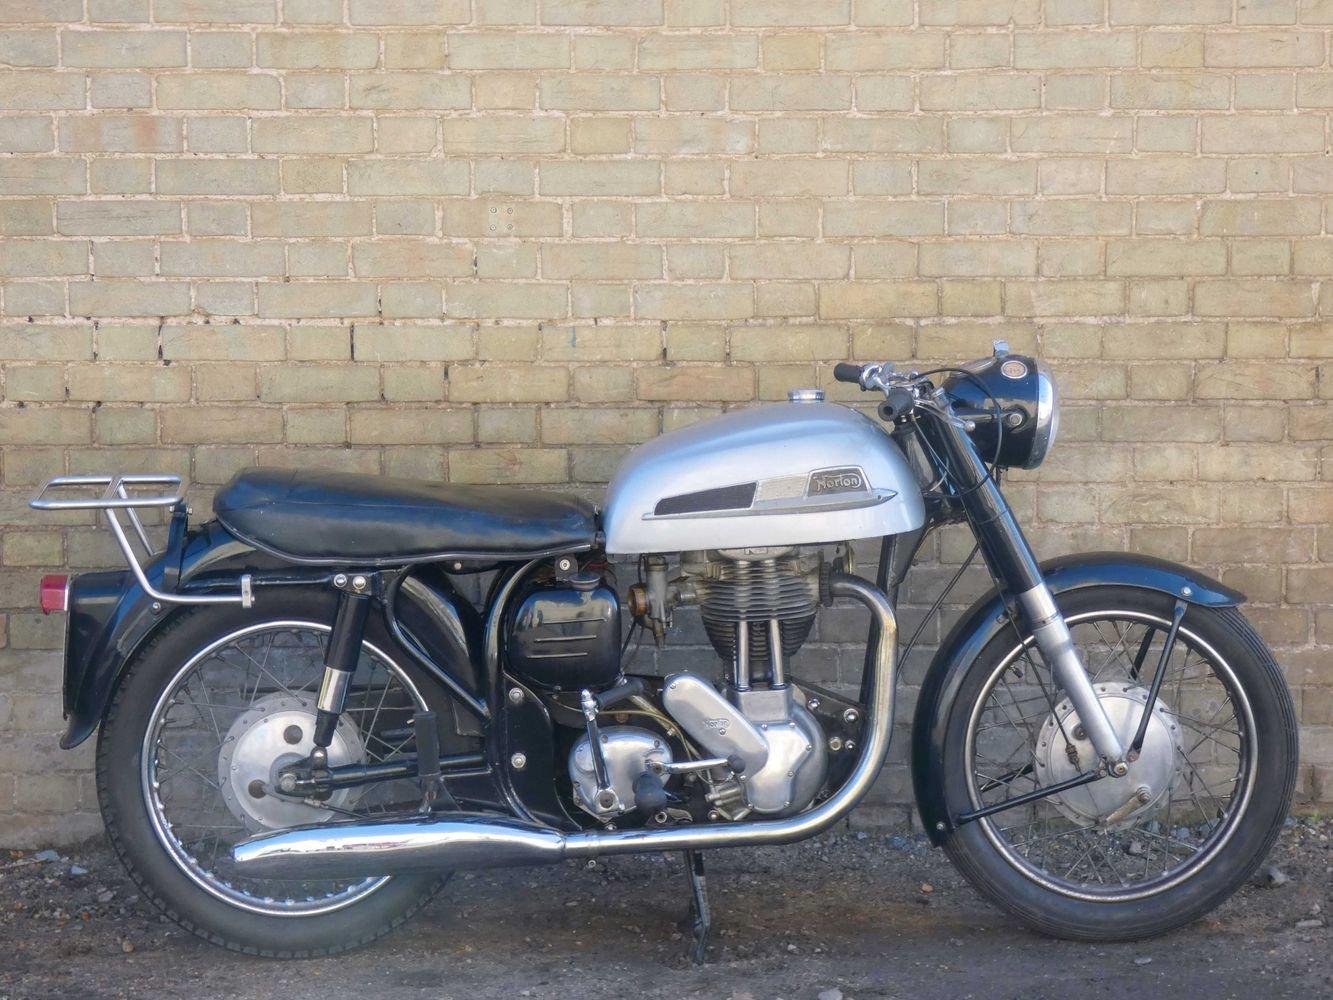 1960 Norton Model 50 350cc For Sale (picture 1 of 6)